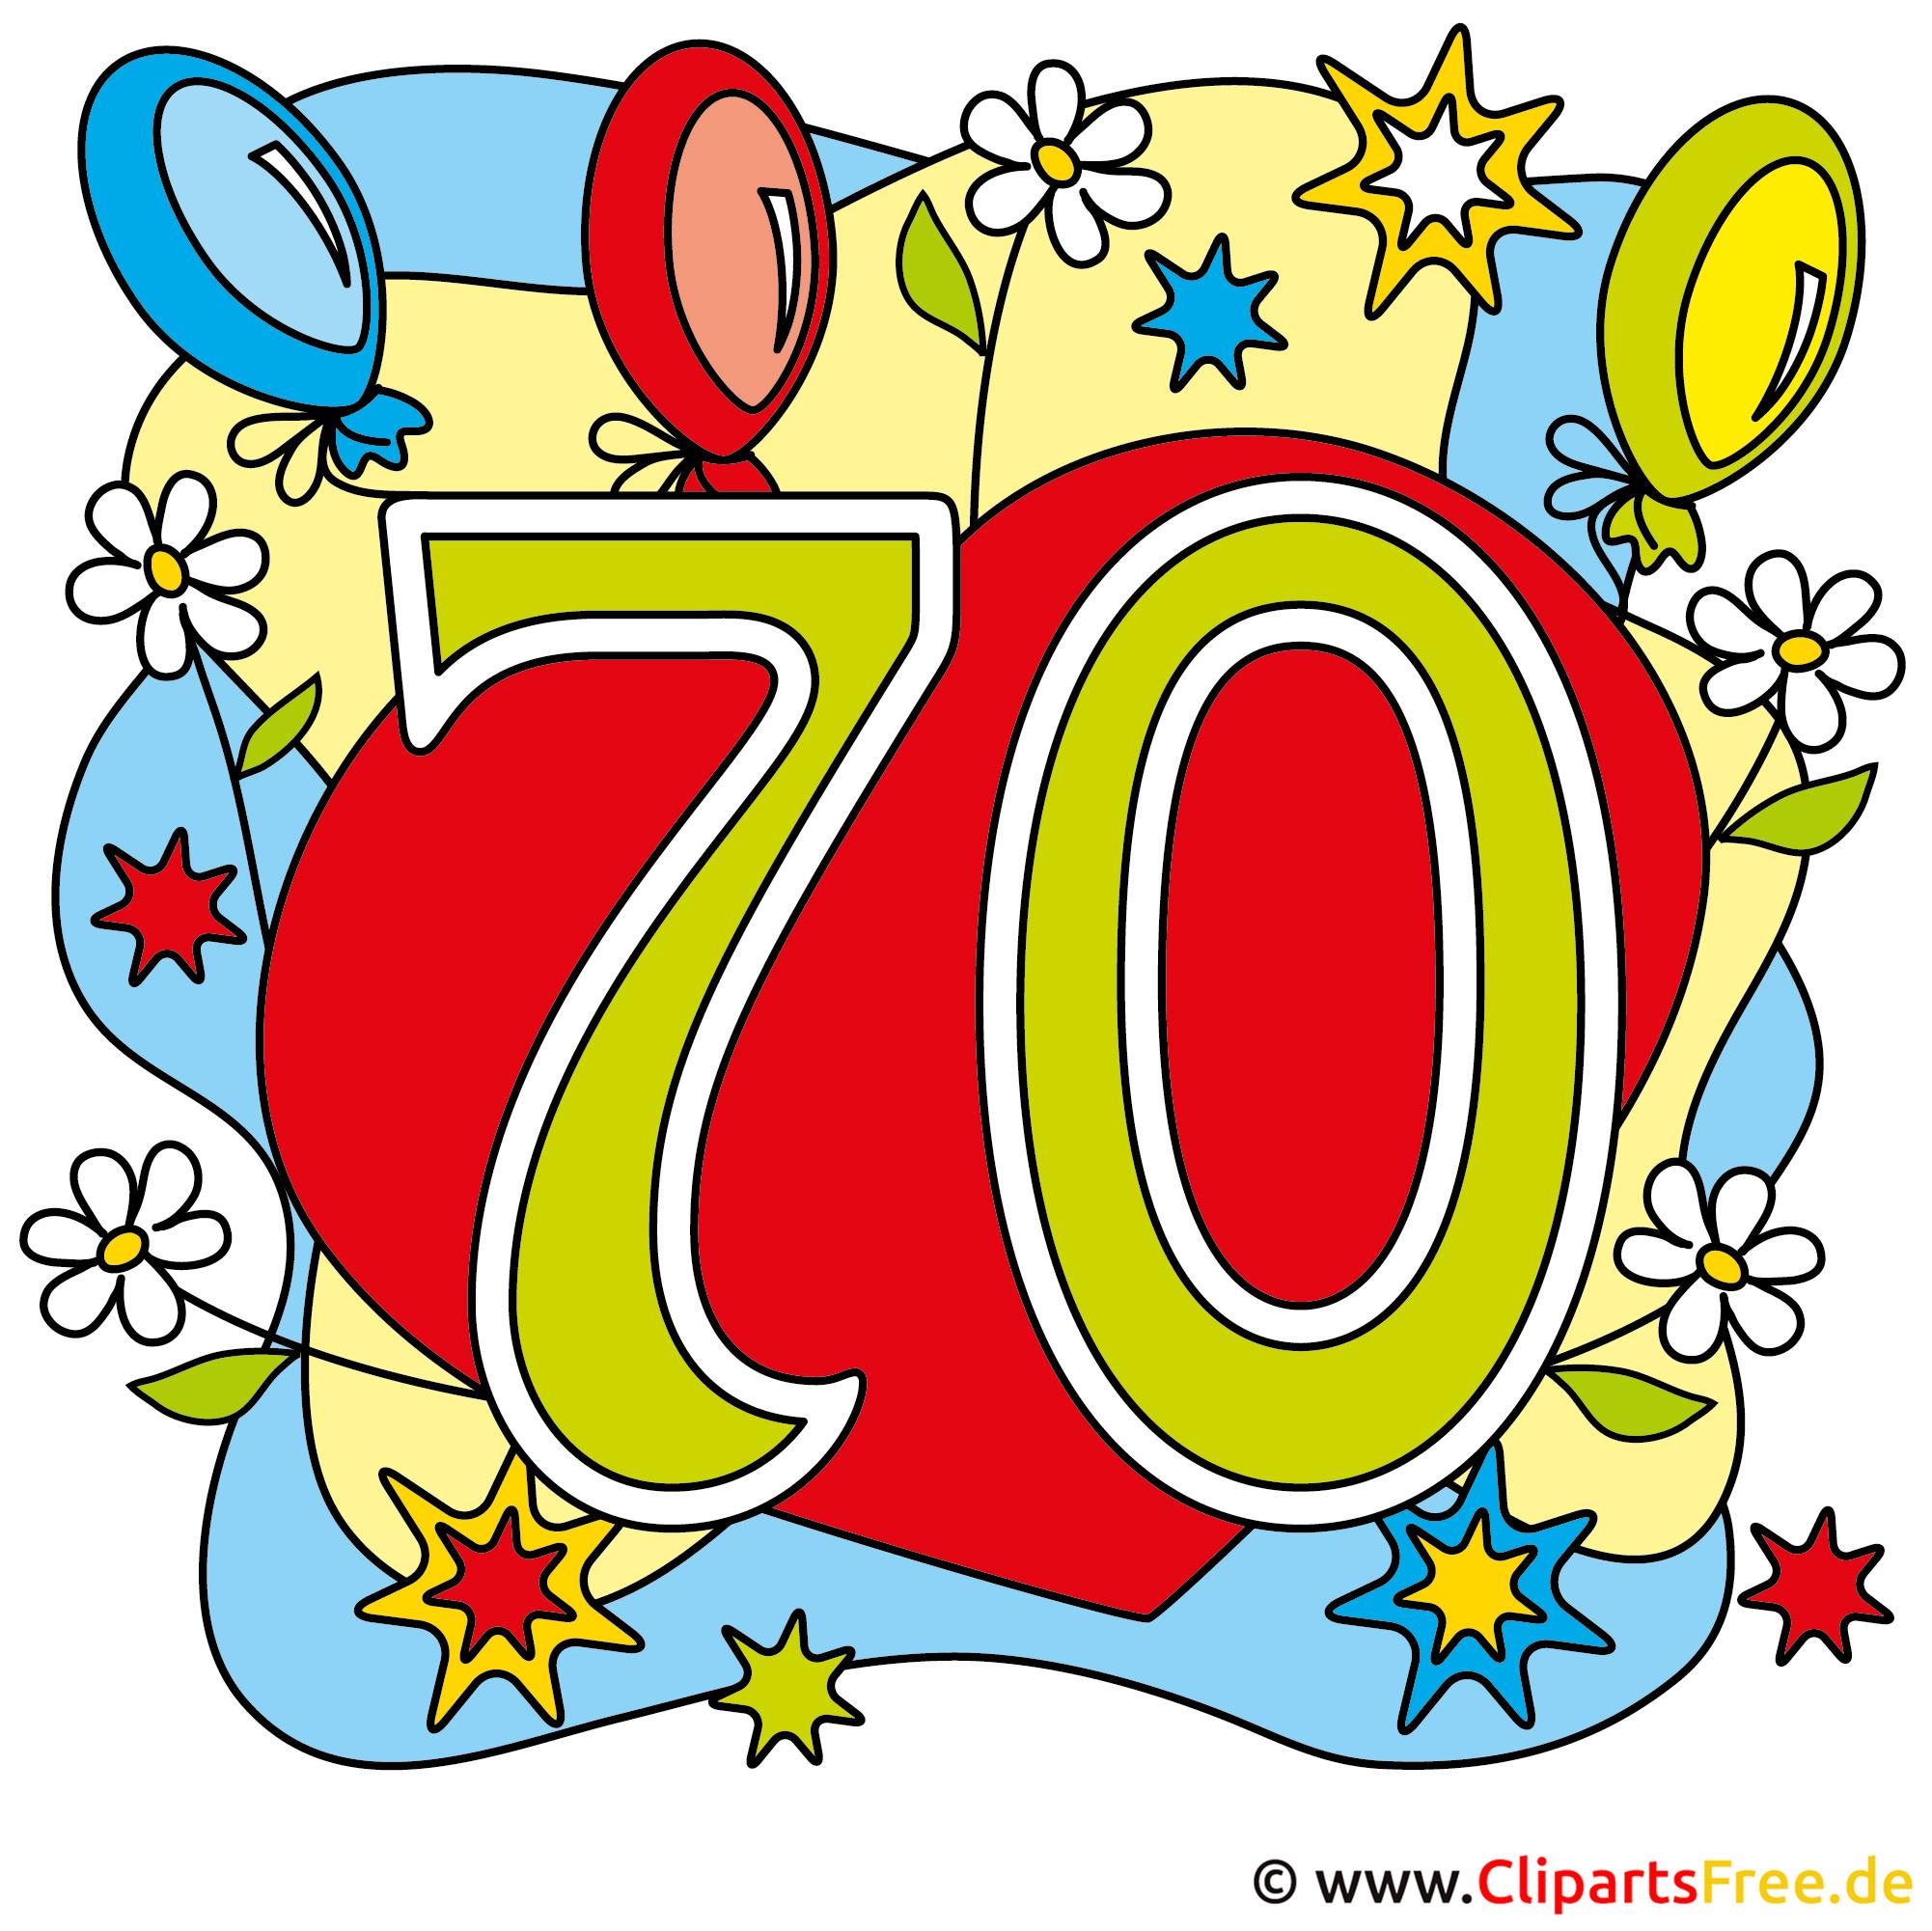 70 Jubiläum Bild, Glückwunschkarte, Clipart